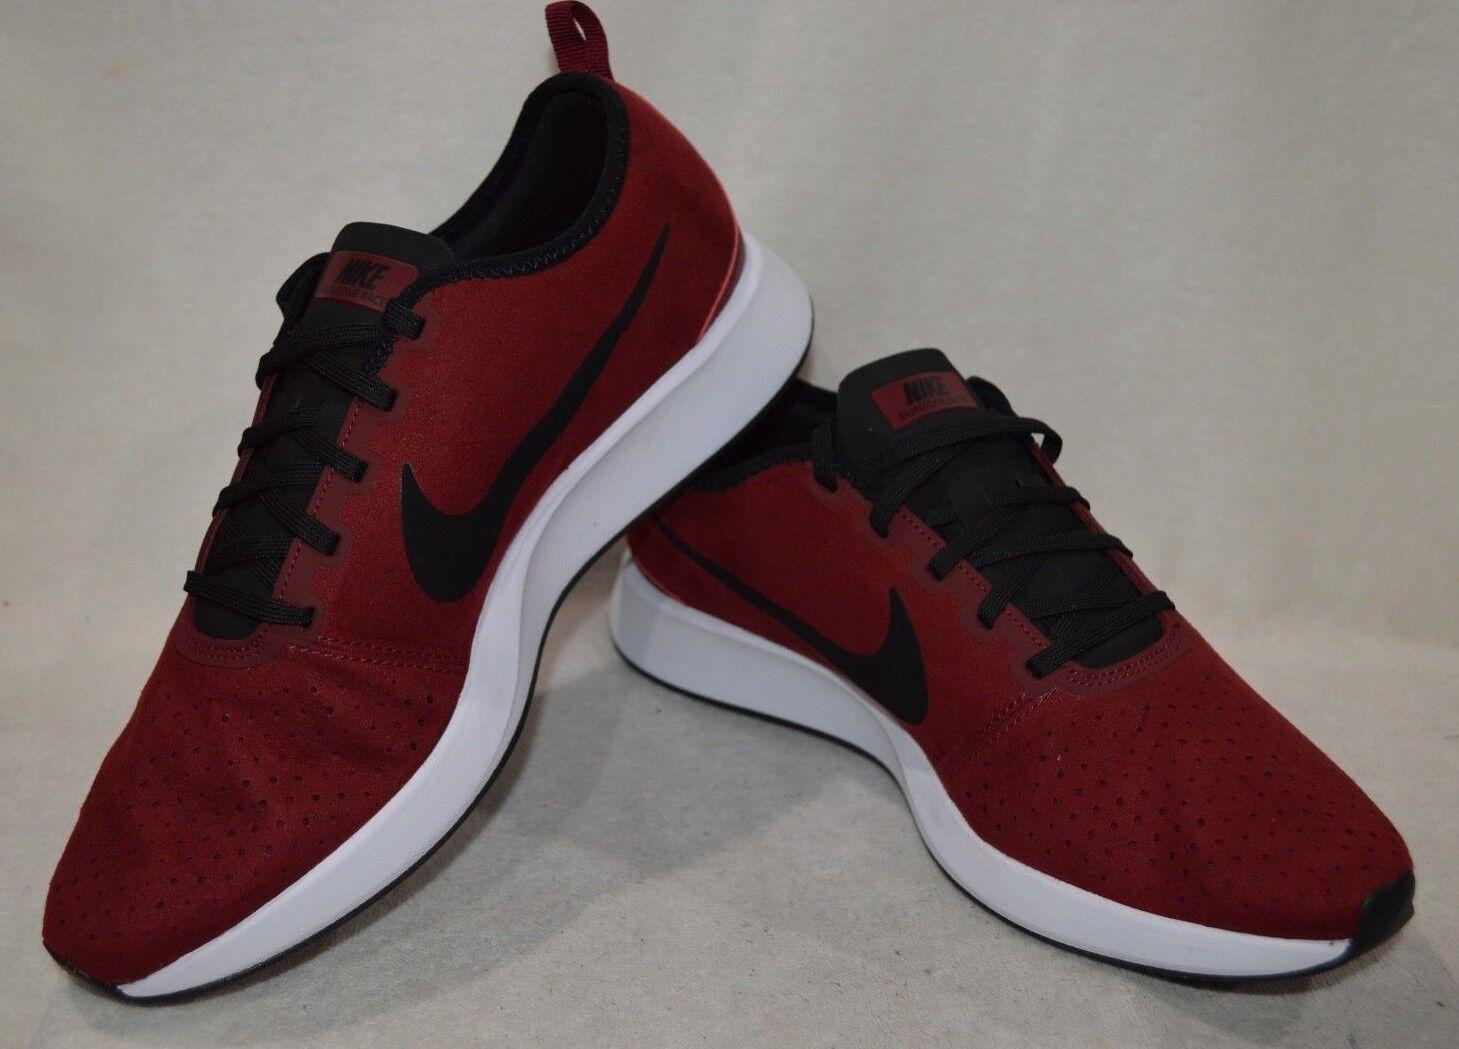 Nike Dualtone Racer PRM Red Black White Men's Casual shoes - Assorted Sizes NWB